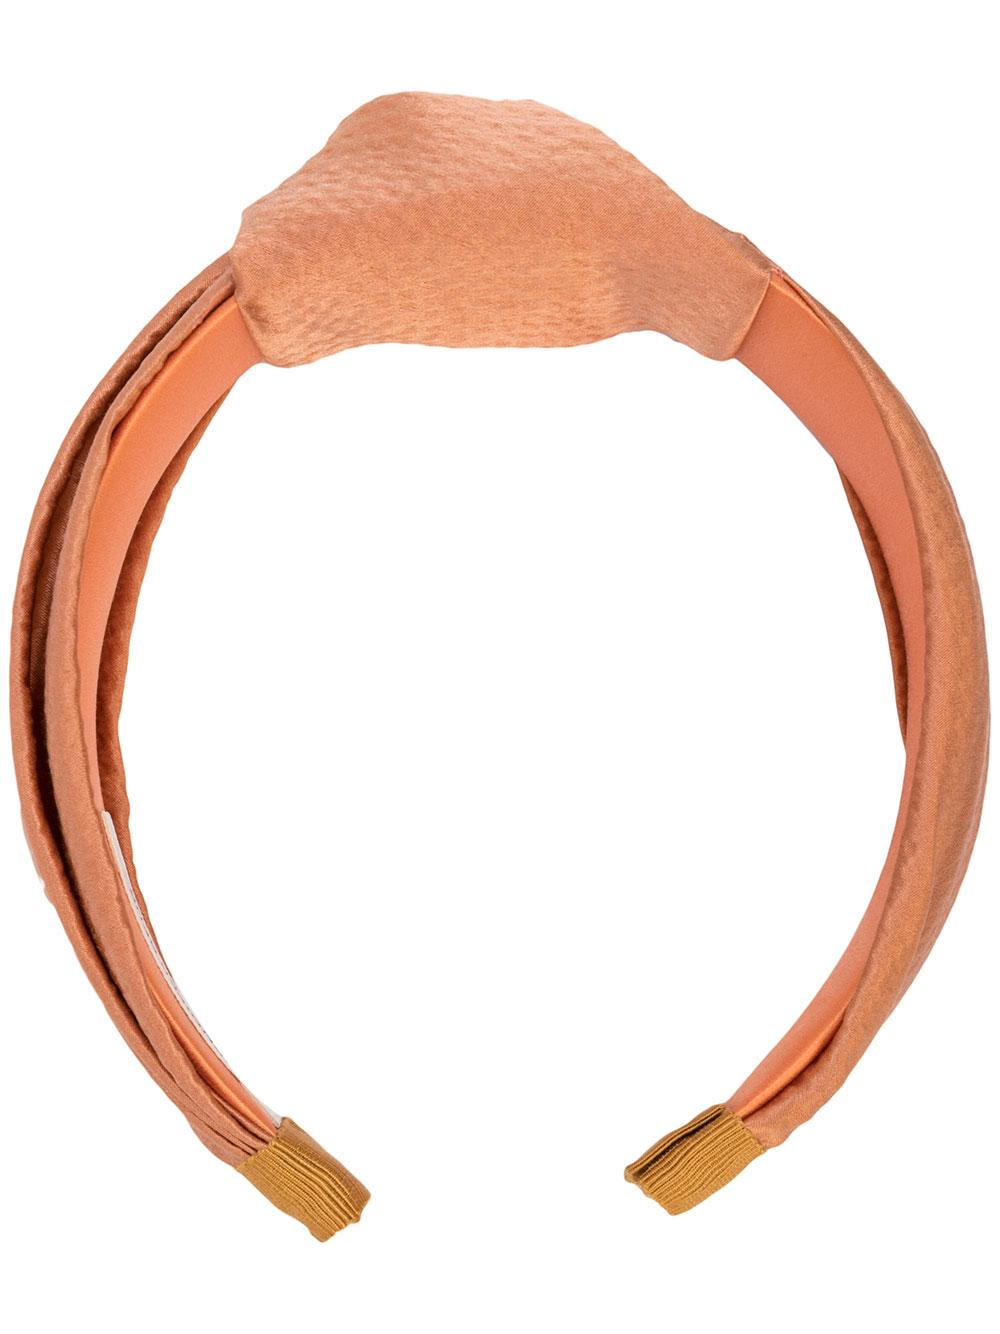 Samaya Headband In Hammered Silk